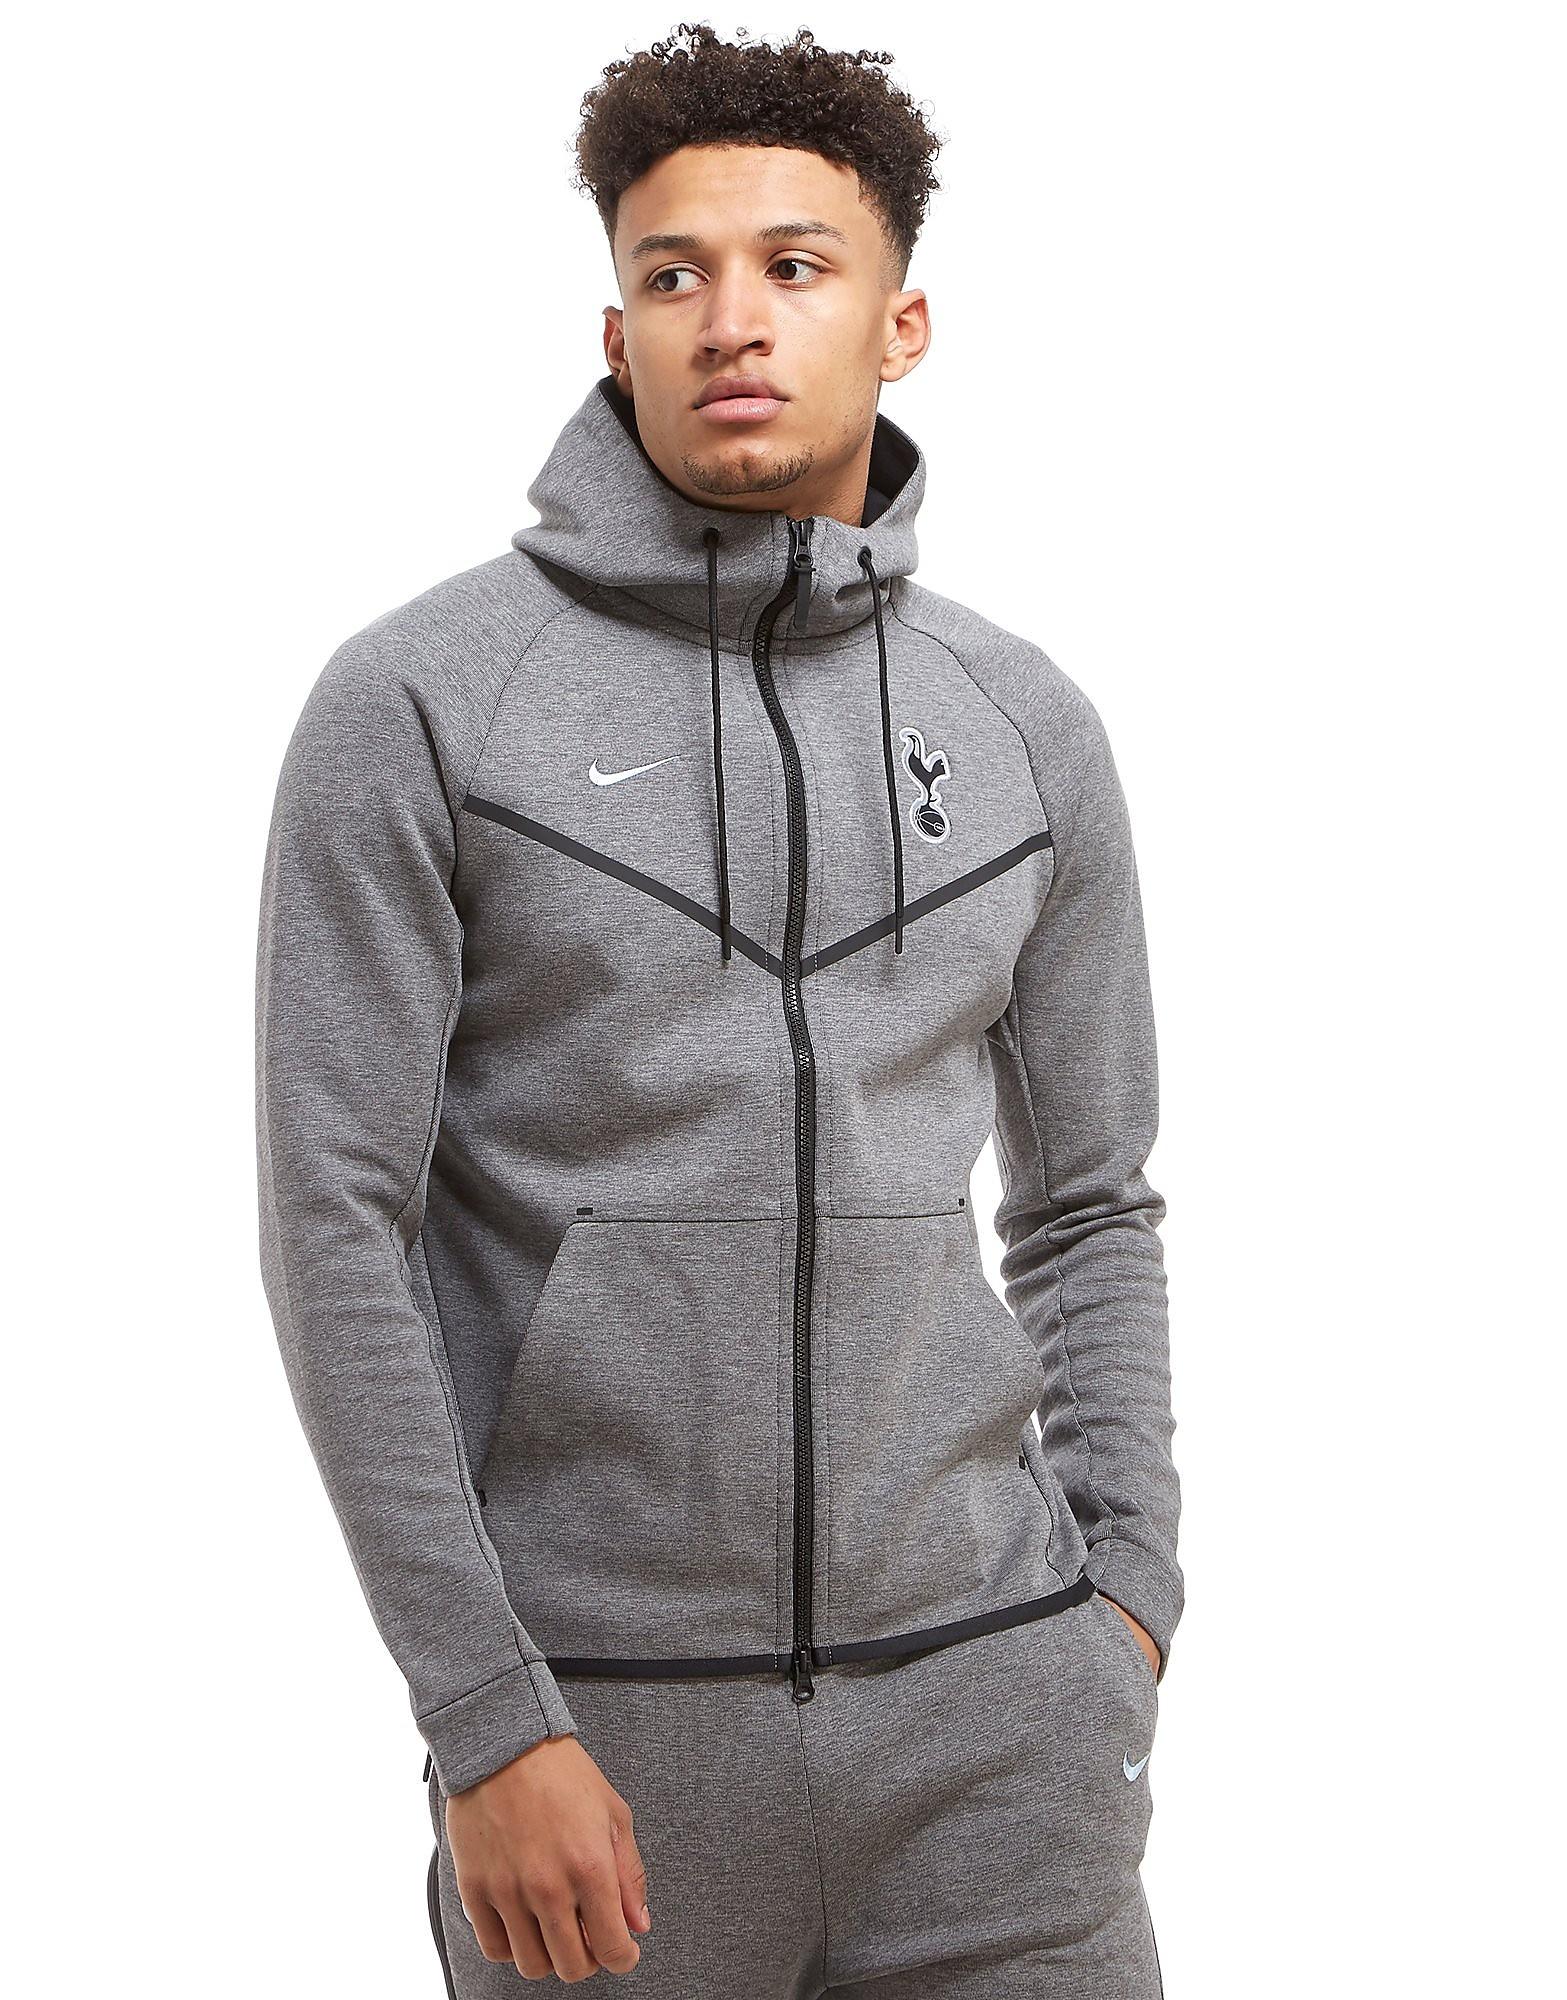 Nike Tottenham Hotspur FC Tech Fleece Hoodie